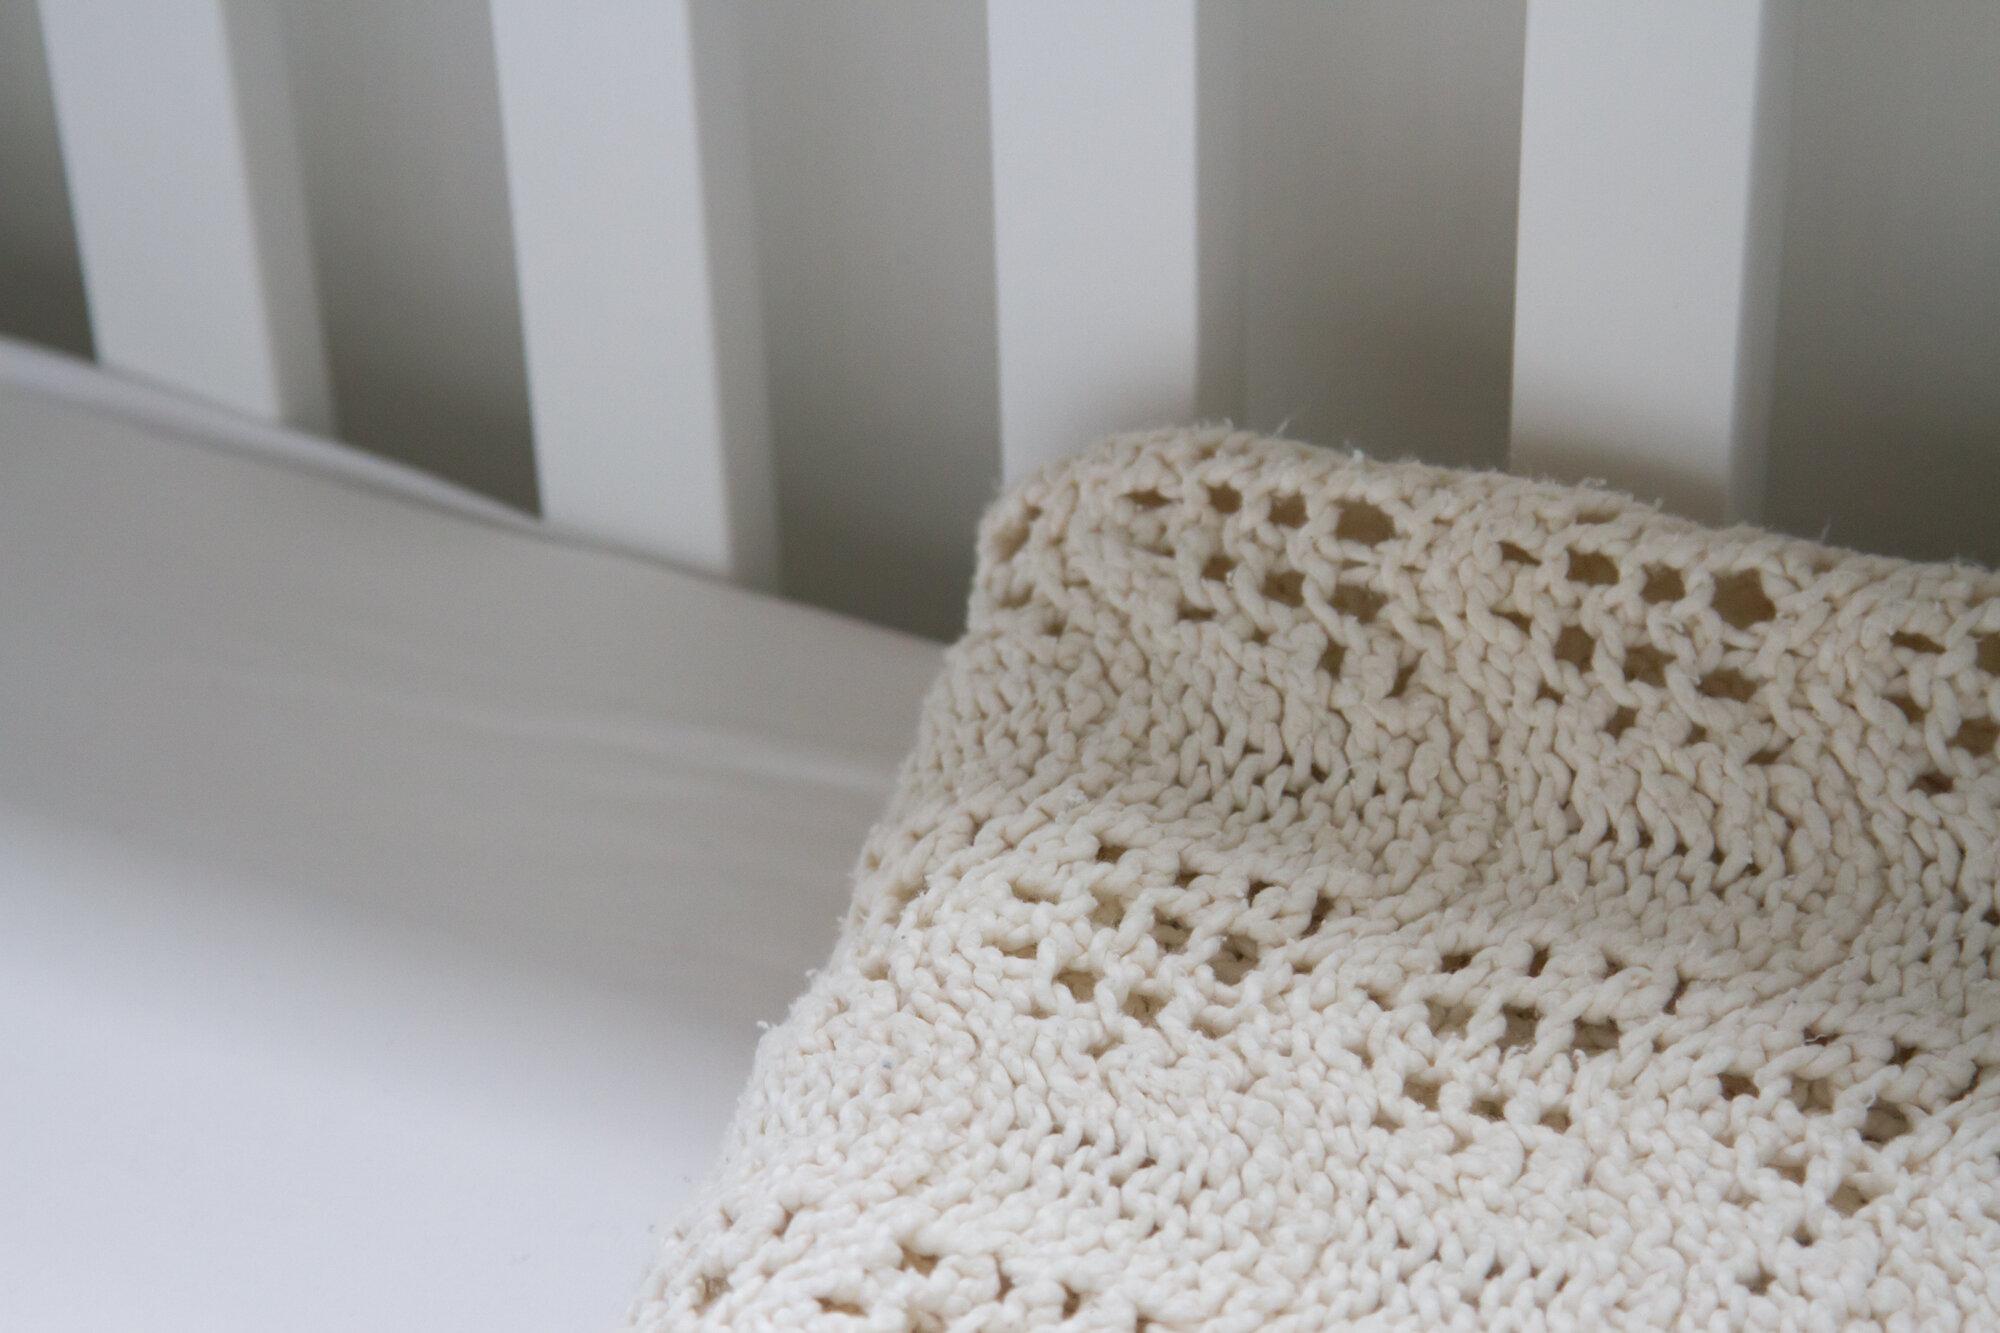 handmade off-white blanket in a white crib